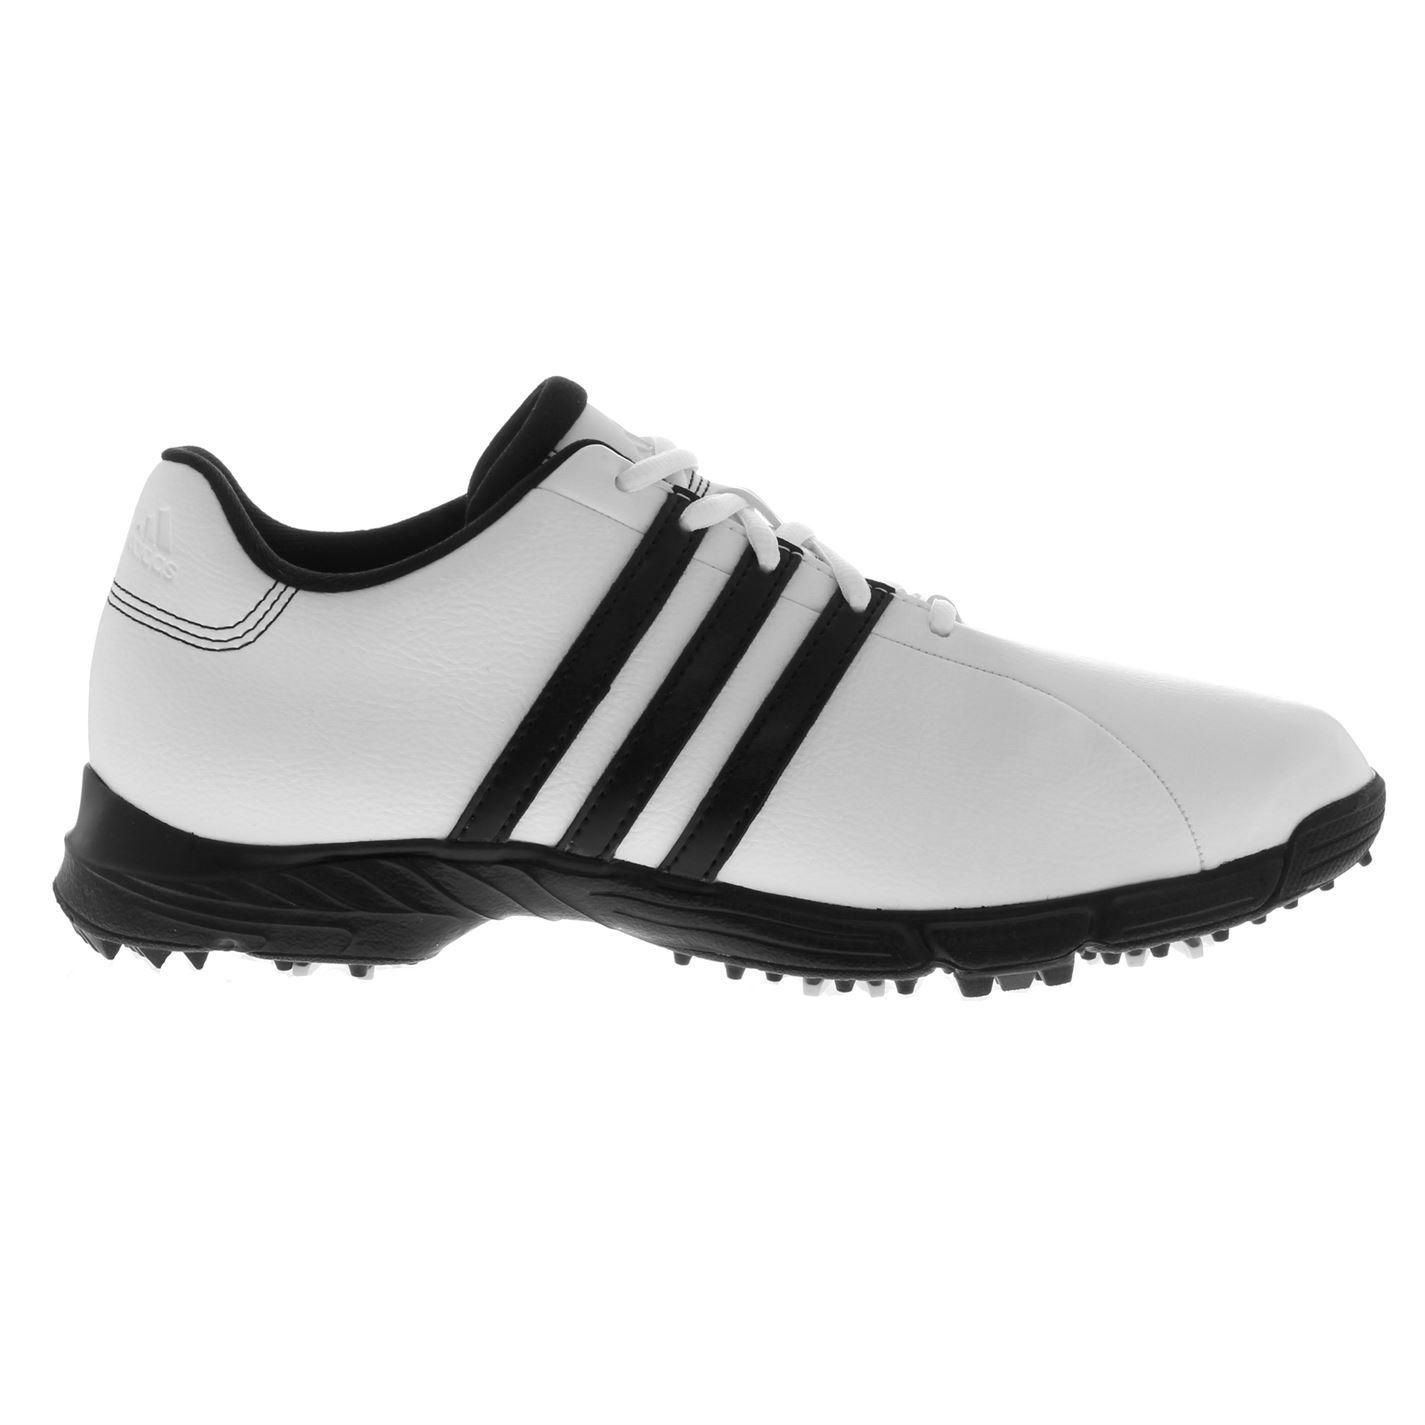 adidas-Golflite-Golf-Shoes-Mens-Spikes-Footwear thumbnail 15